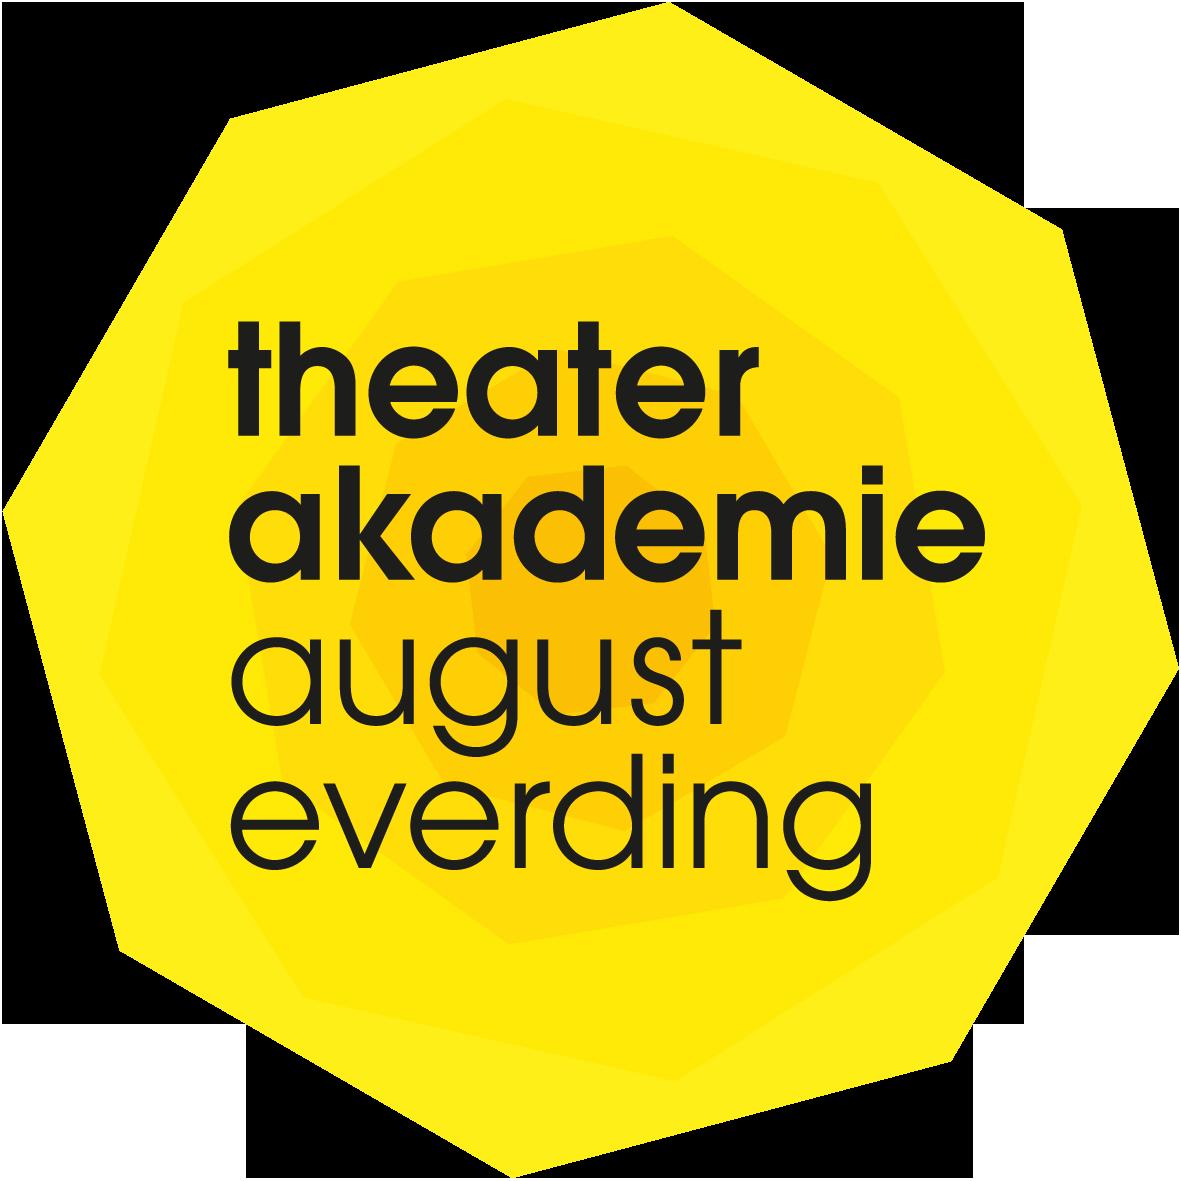 Theaterakademie